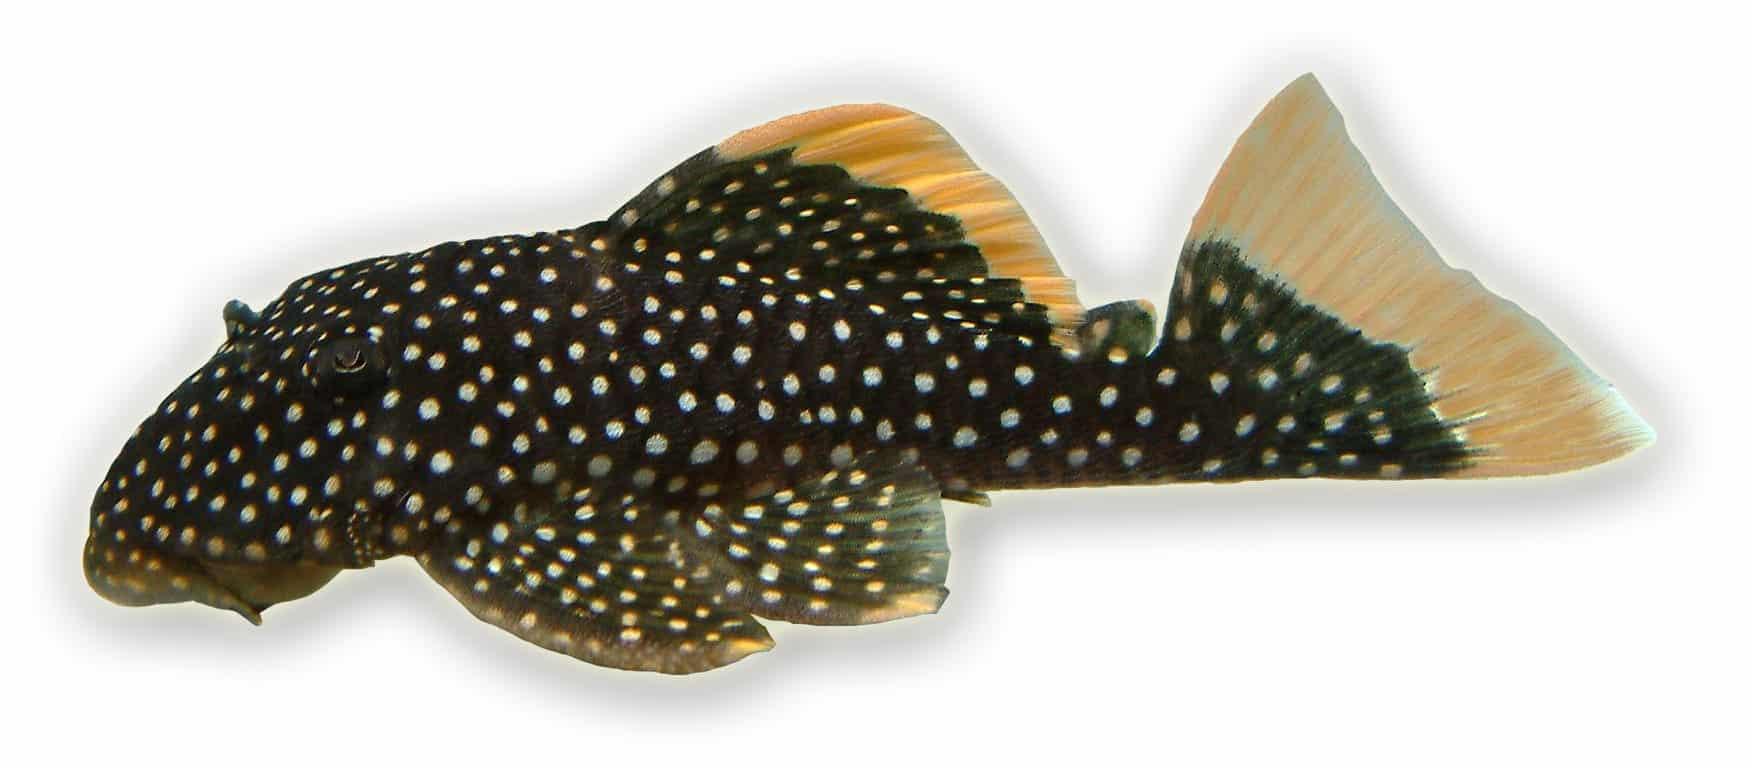 Baryancistrus xanthellus L81 - Gelbsaum-Prachtharnischwels (small spot)